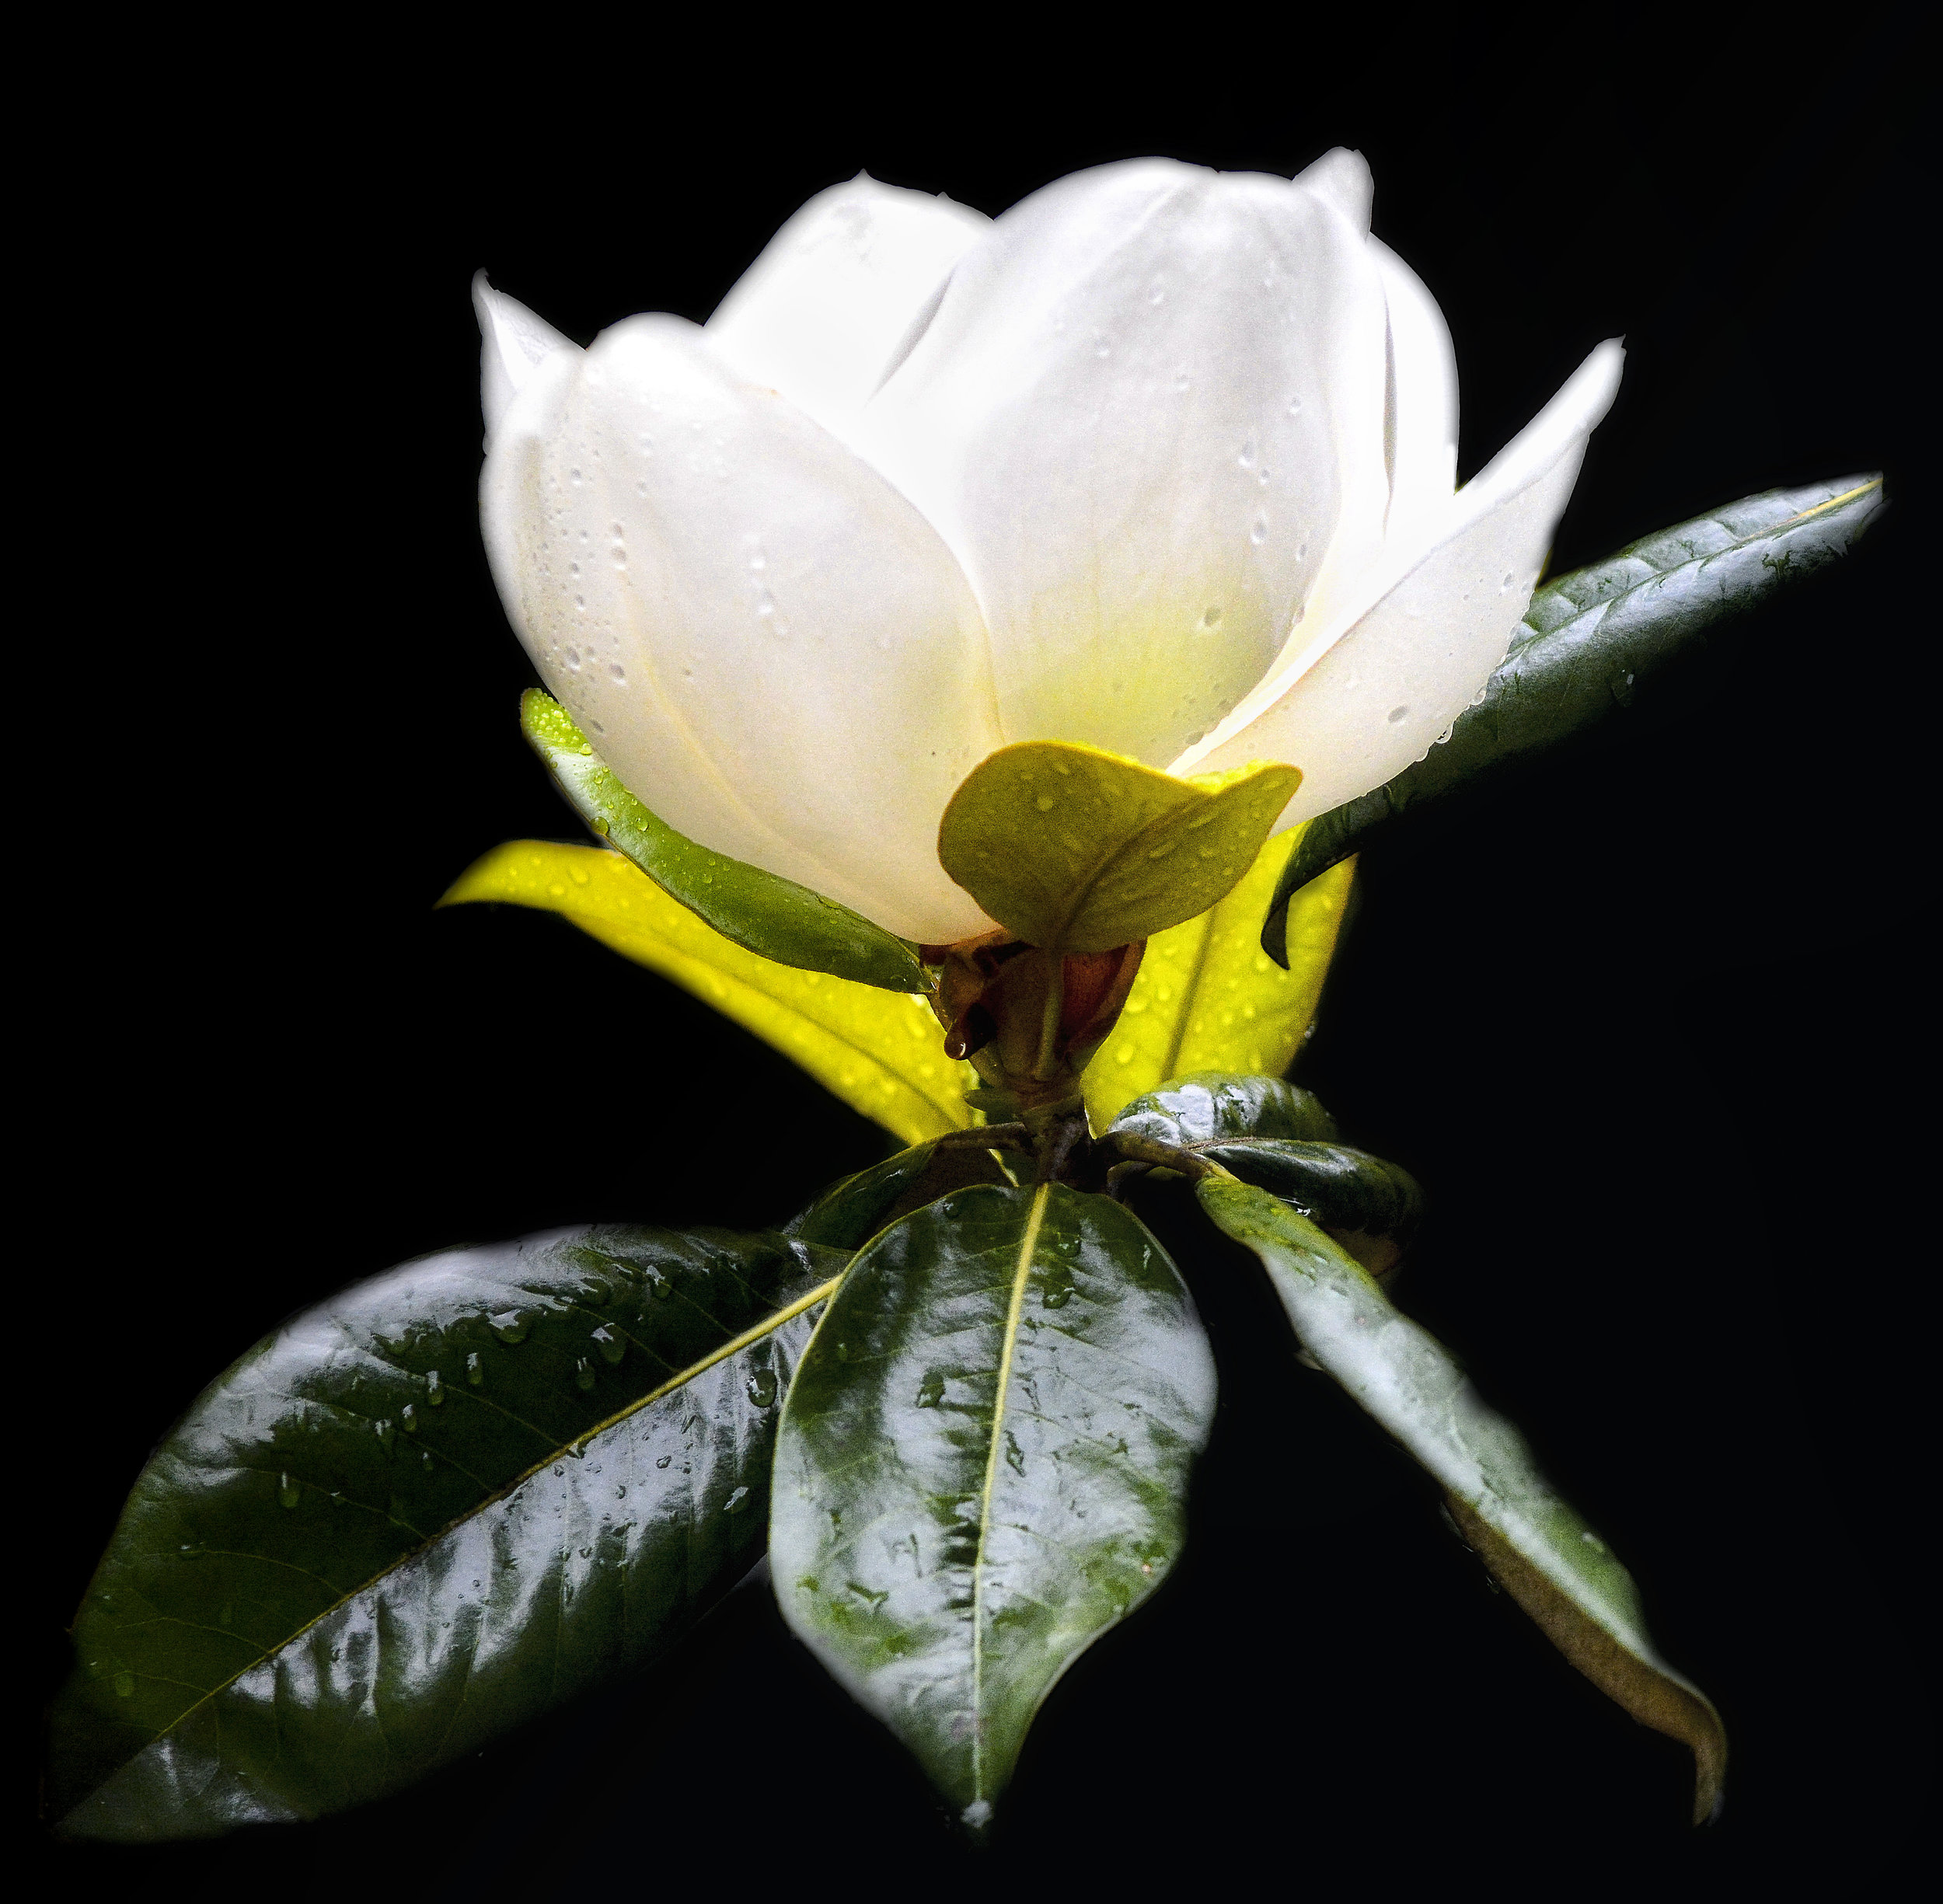 2017-05-31 001 095 - Copy FLOWER ONLY JPG 1.jpg